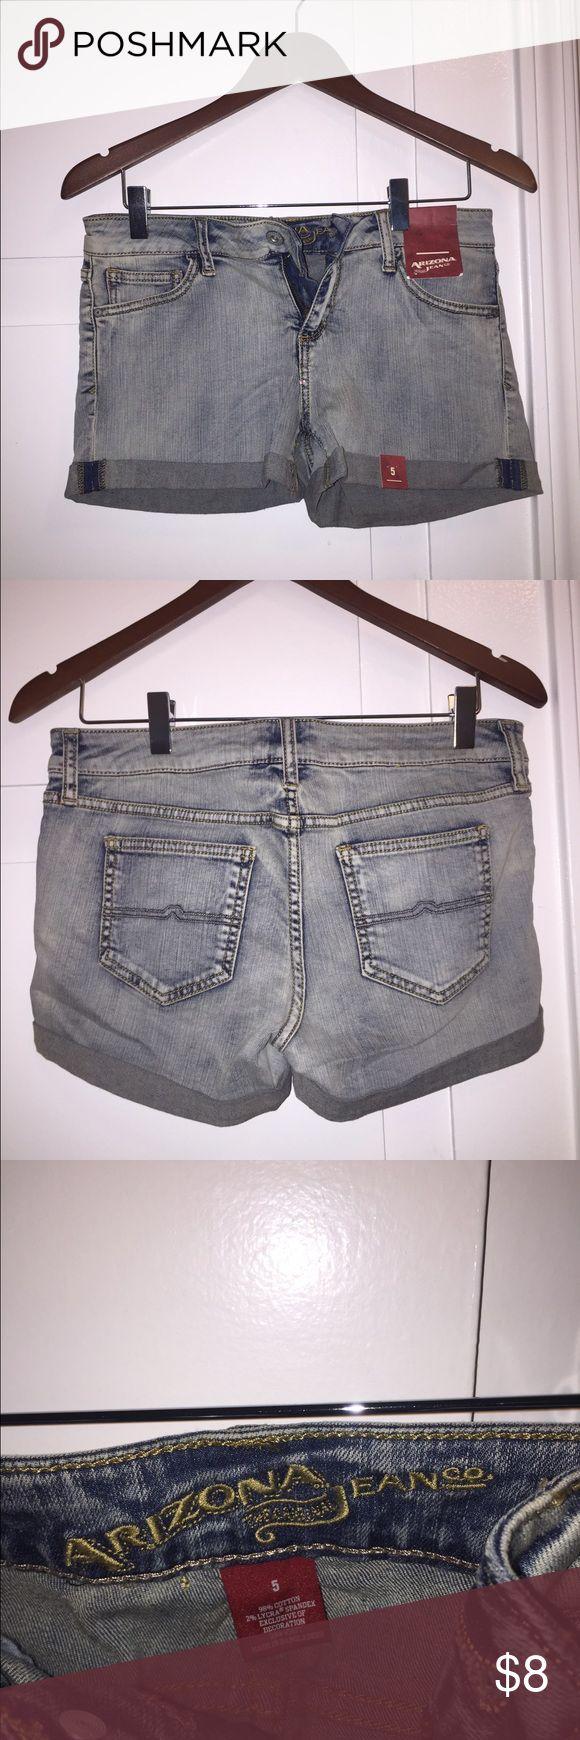 Arizona Jean Co. Blue Jean Shorts Brand new with tags Arizona Jean Co. blue jeans shorts in size 5. Arizona Jean Company Shorts Jean Shorts